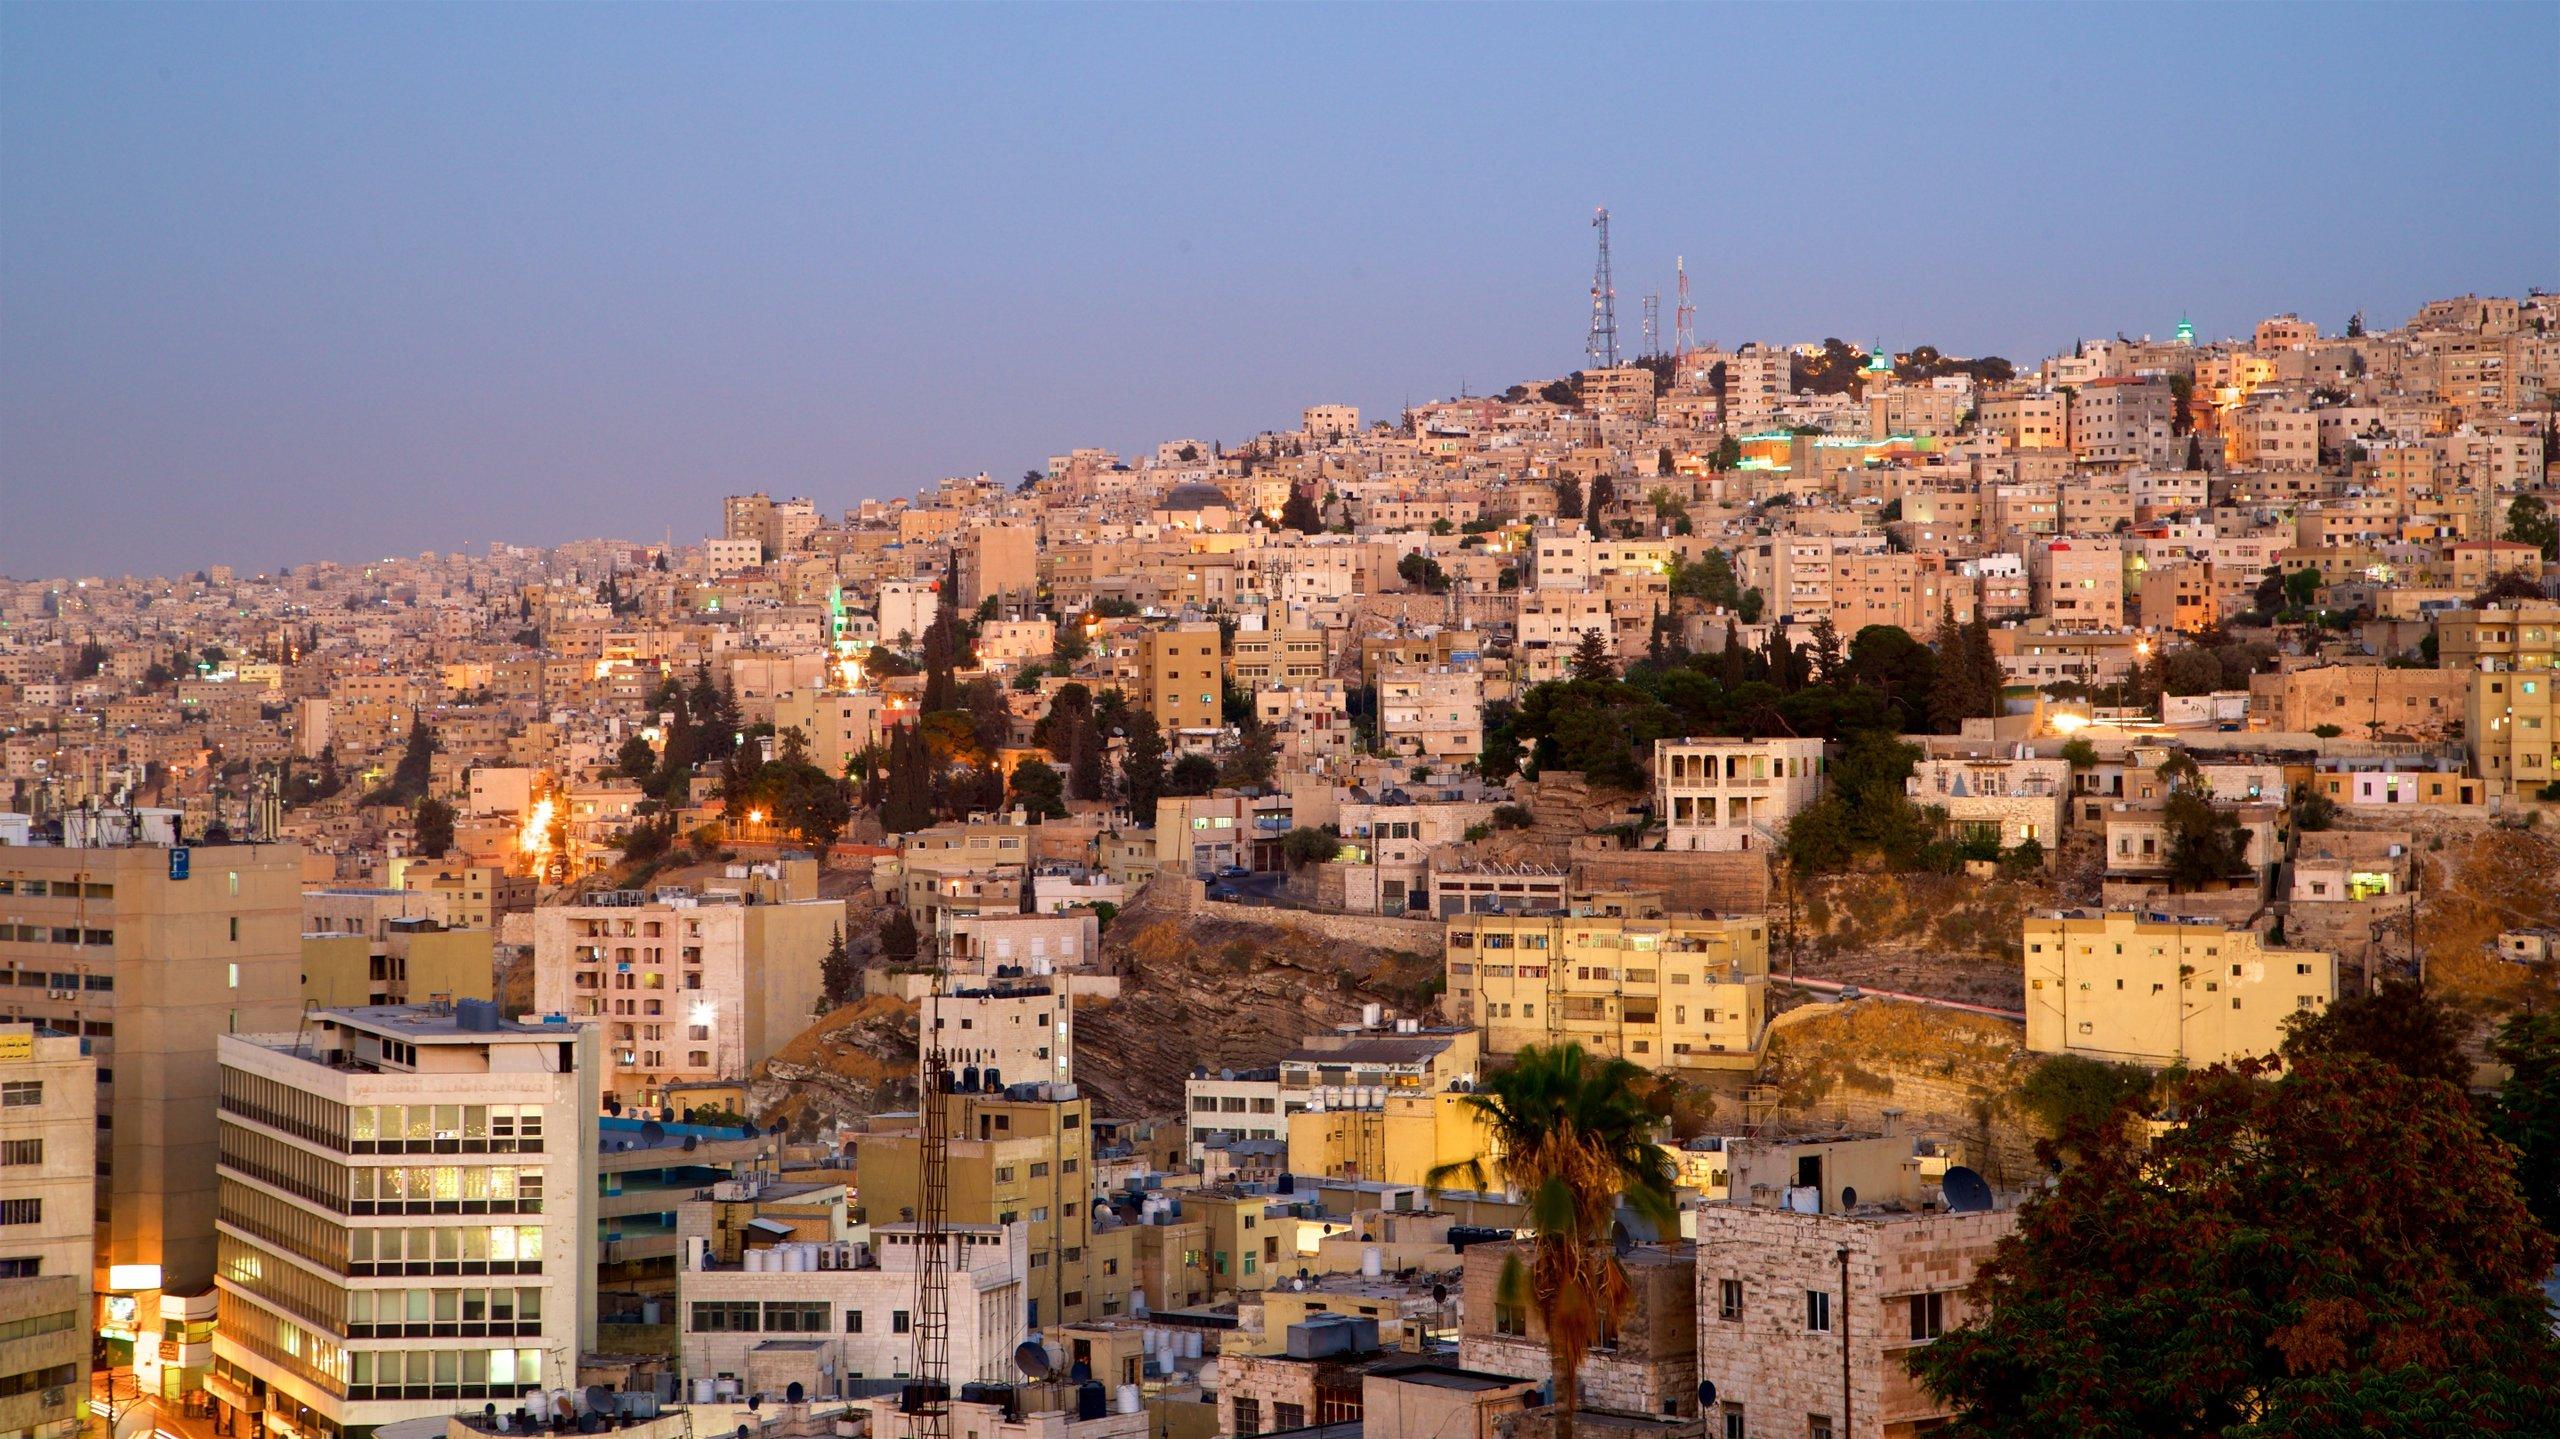 Amman, Amman Governorate, Jordan